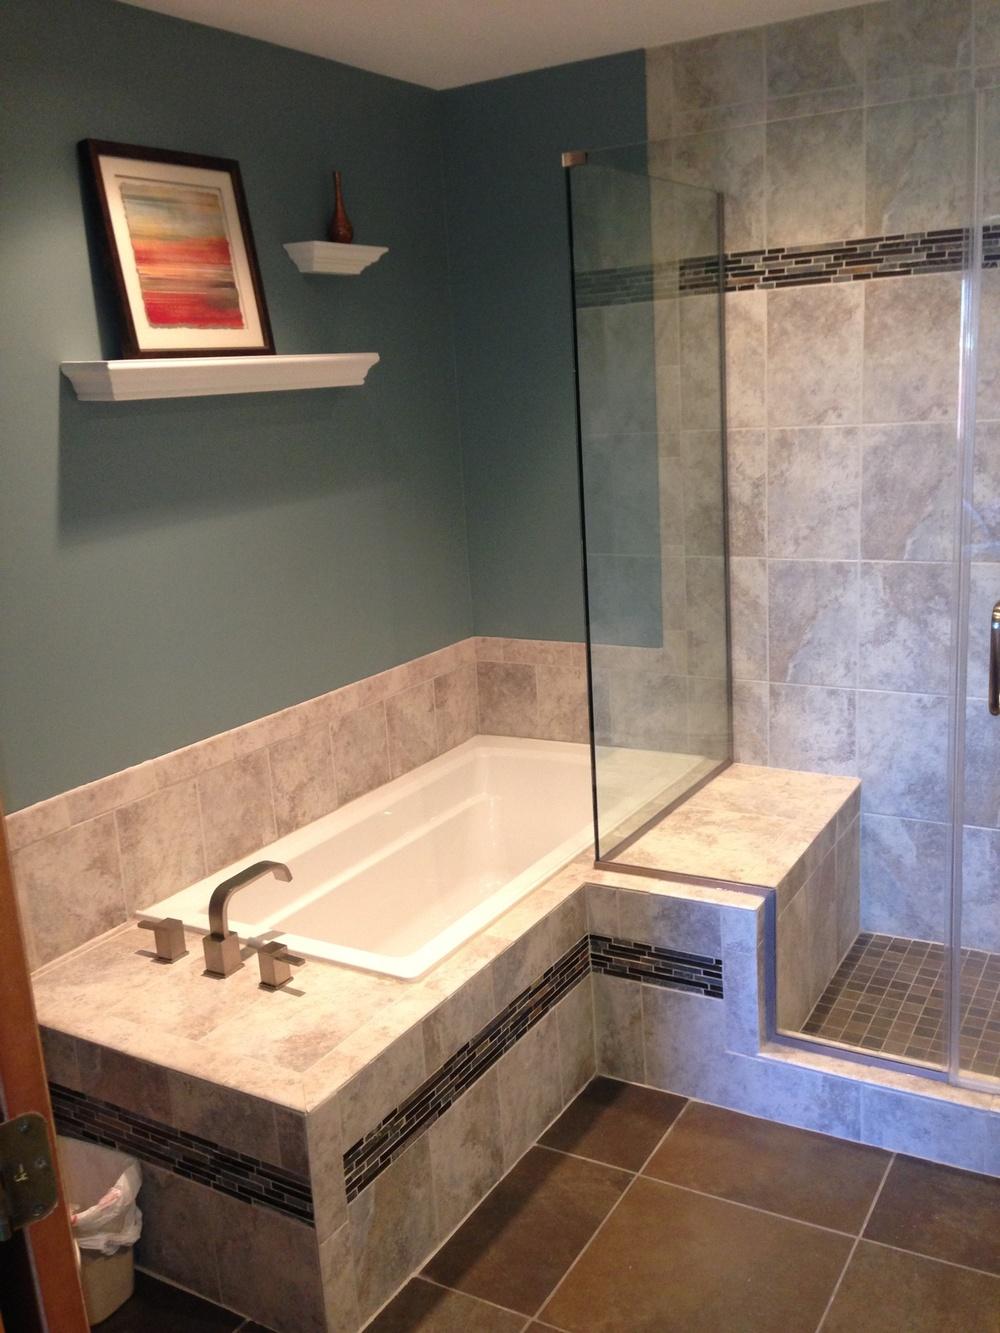 Kitchen and Bathroom Remodeling — Kevin Szabo Jr Plumbing - Plumbing ...